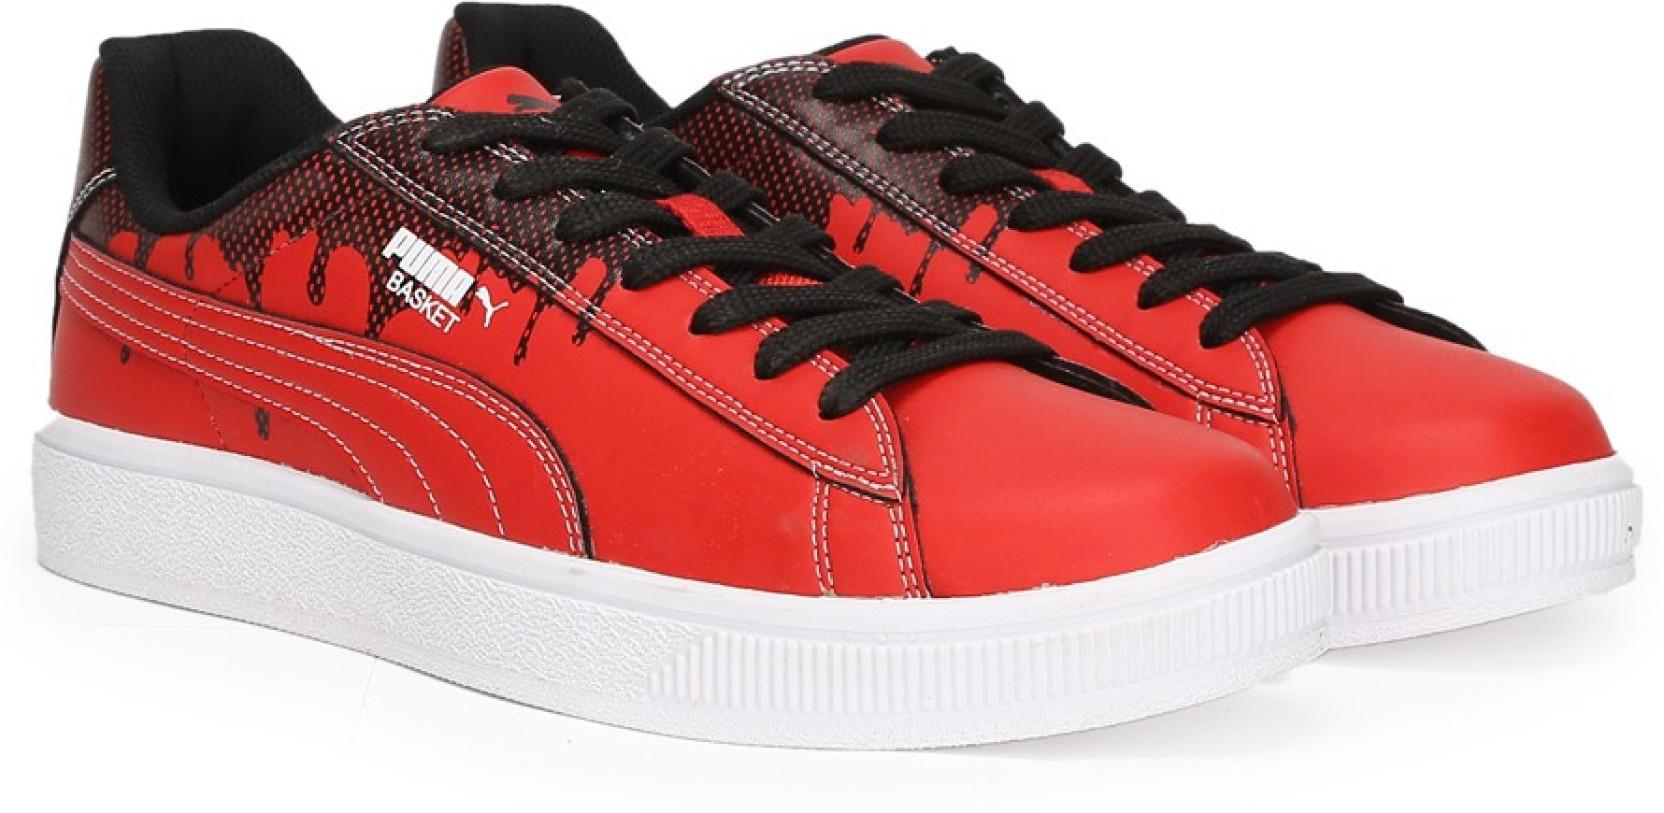 7c6be130b6e Puma Basket City DP Sneakers For Men - Buy High Risk Red-Puma Black ...